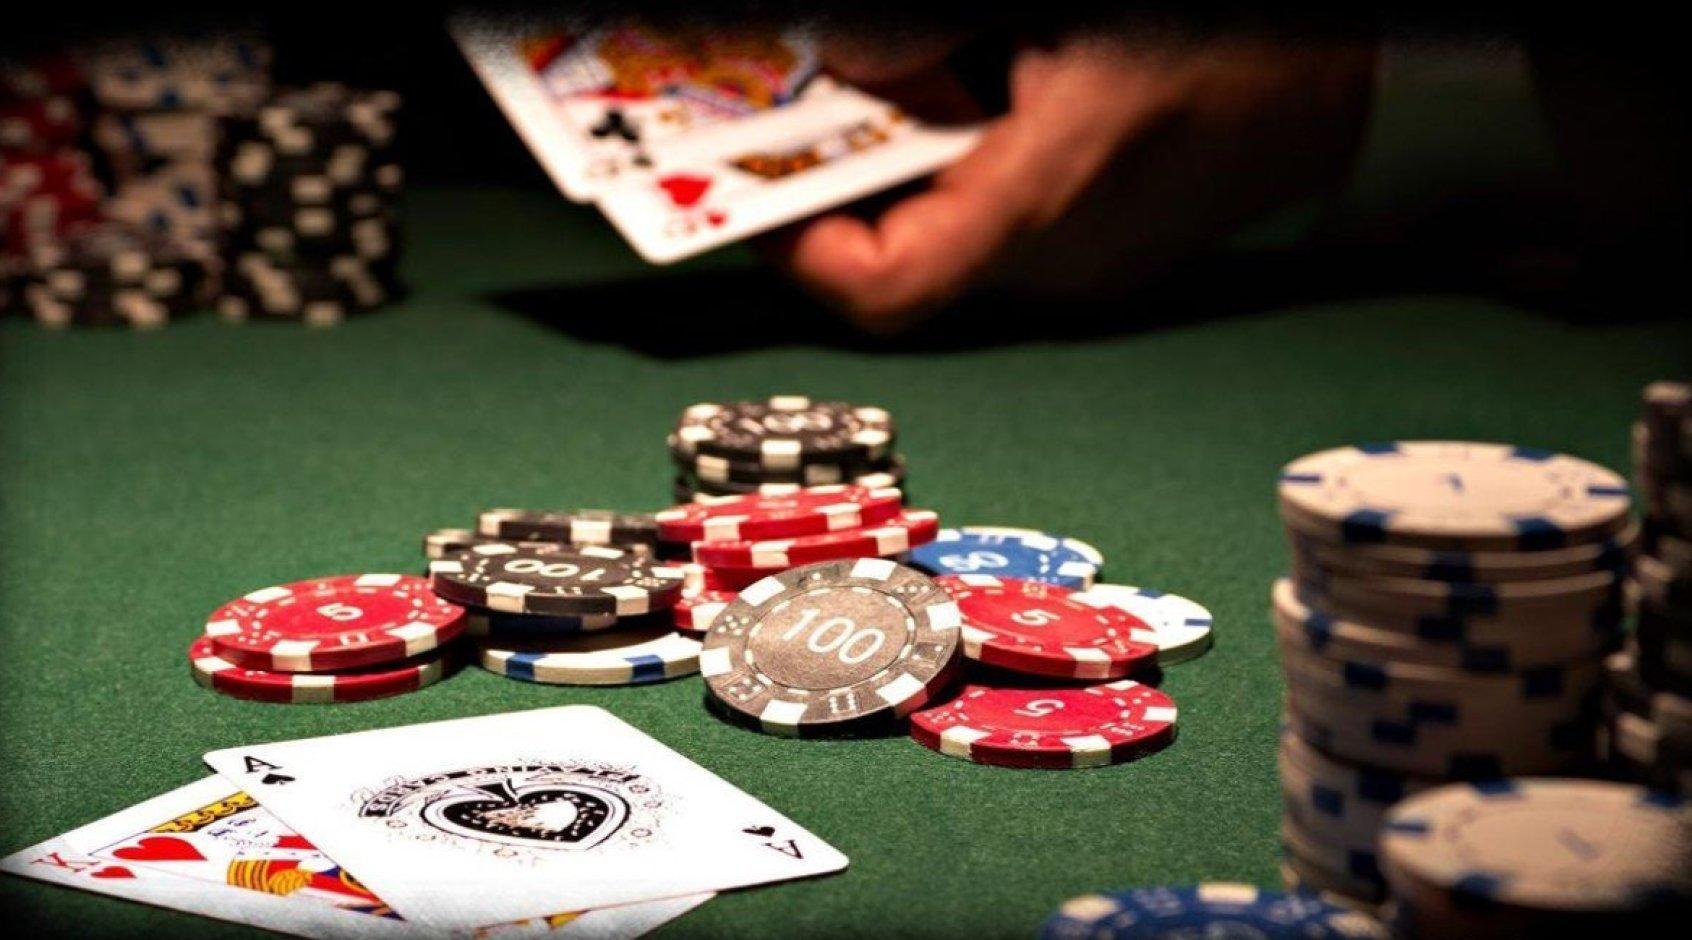 """Дневник регуляра"" от PokerMatch: 100 000 гривен каждую неделю"